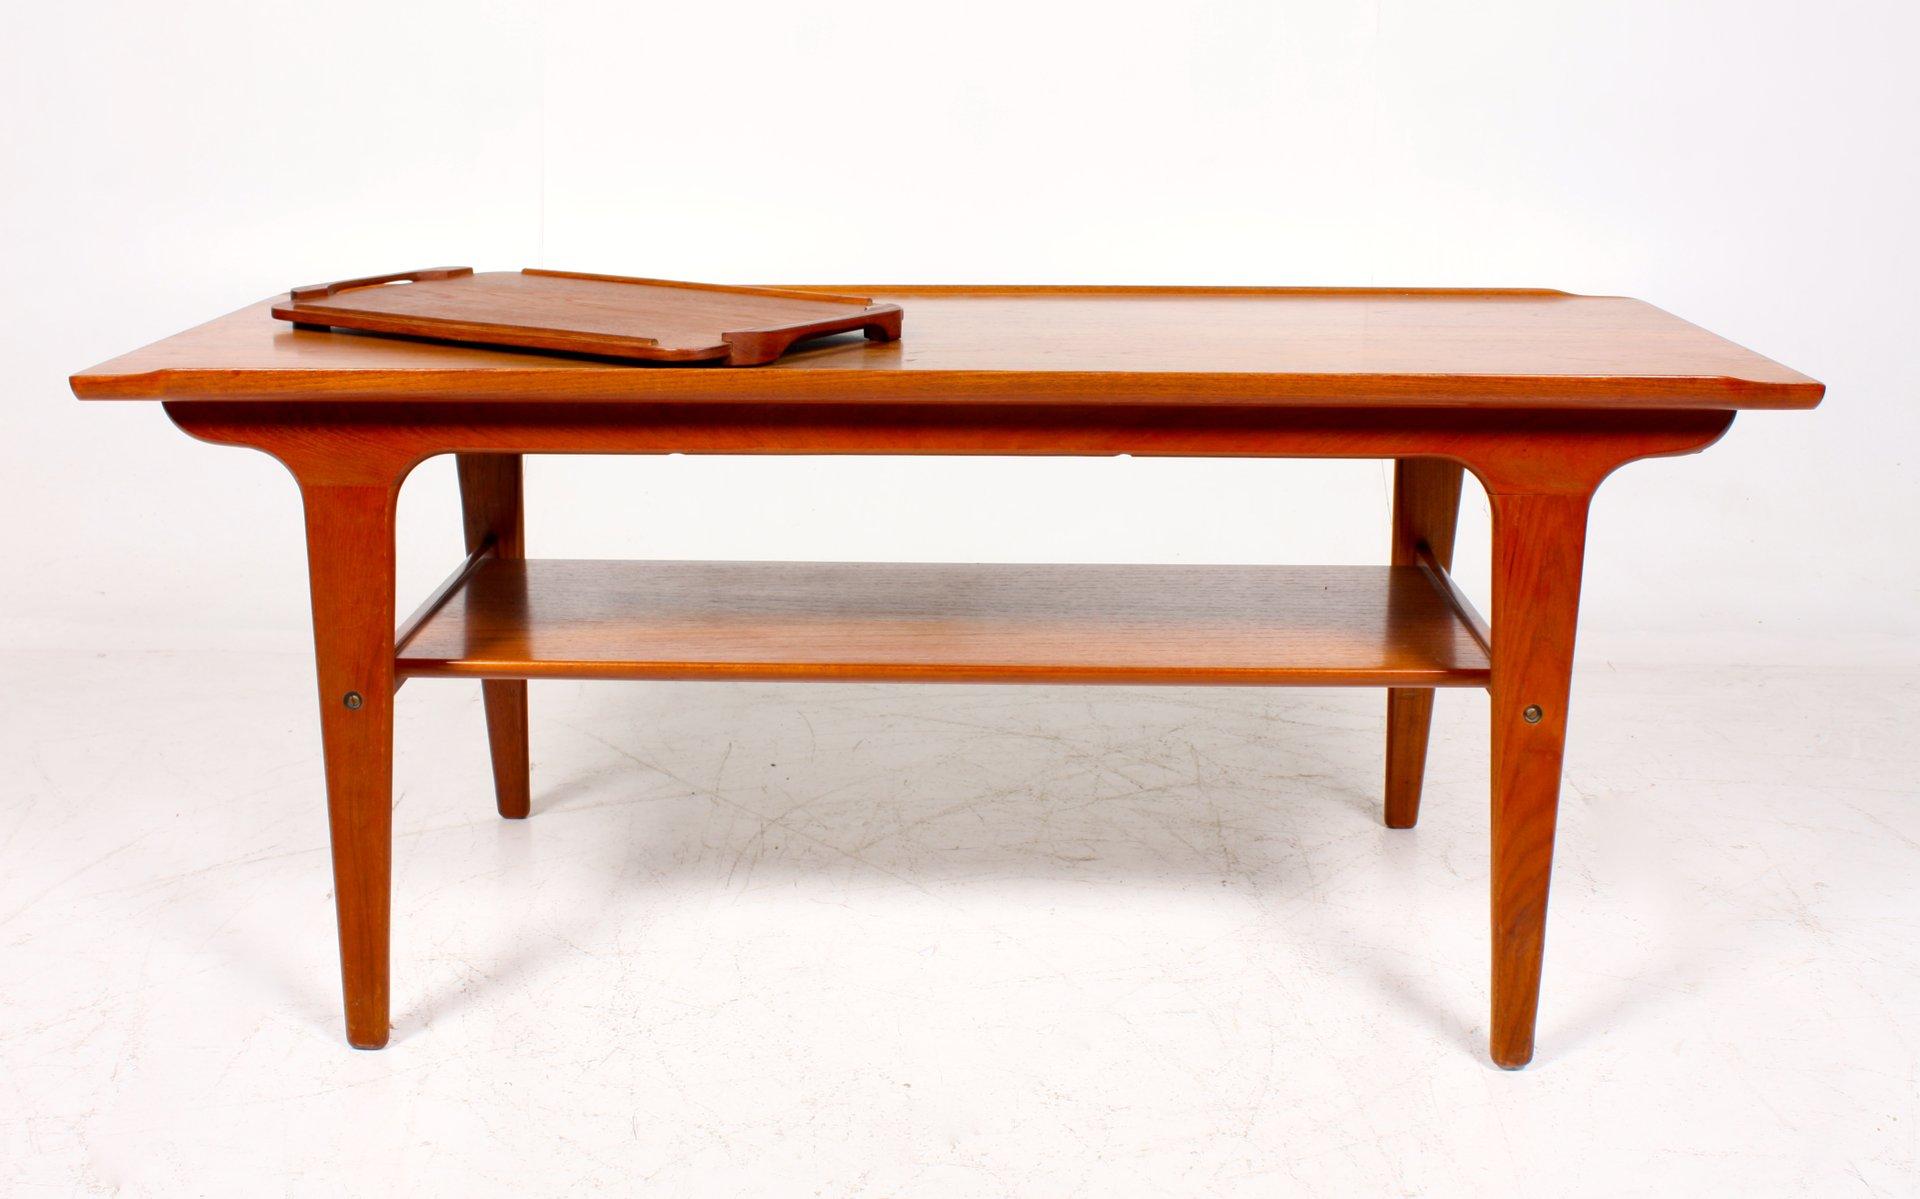 Vintage Teak Coffee Table For Sale At Pamono